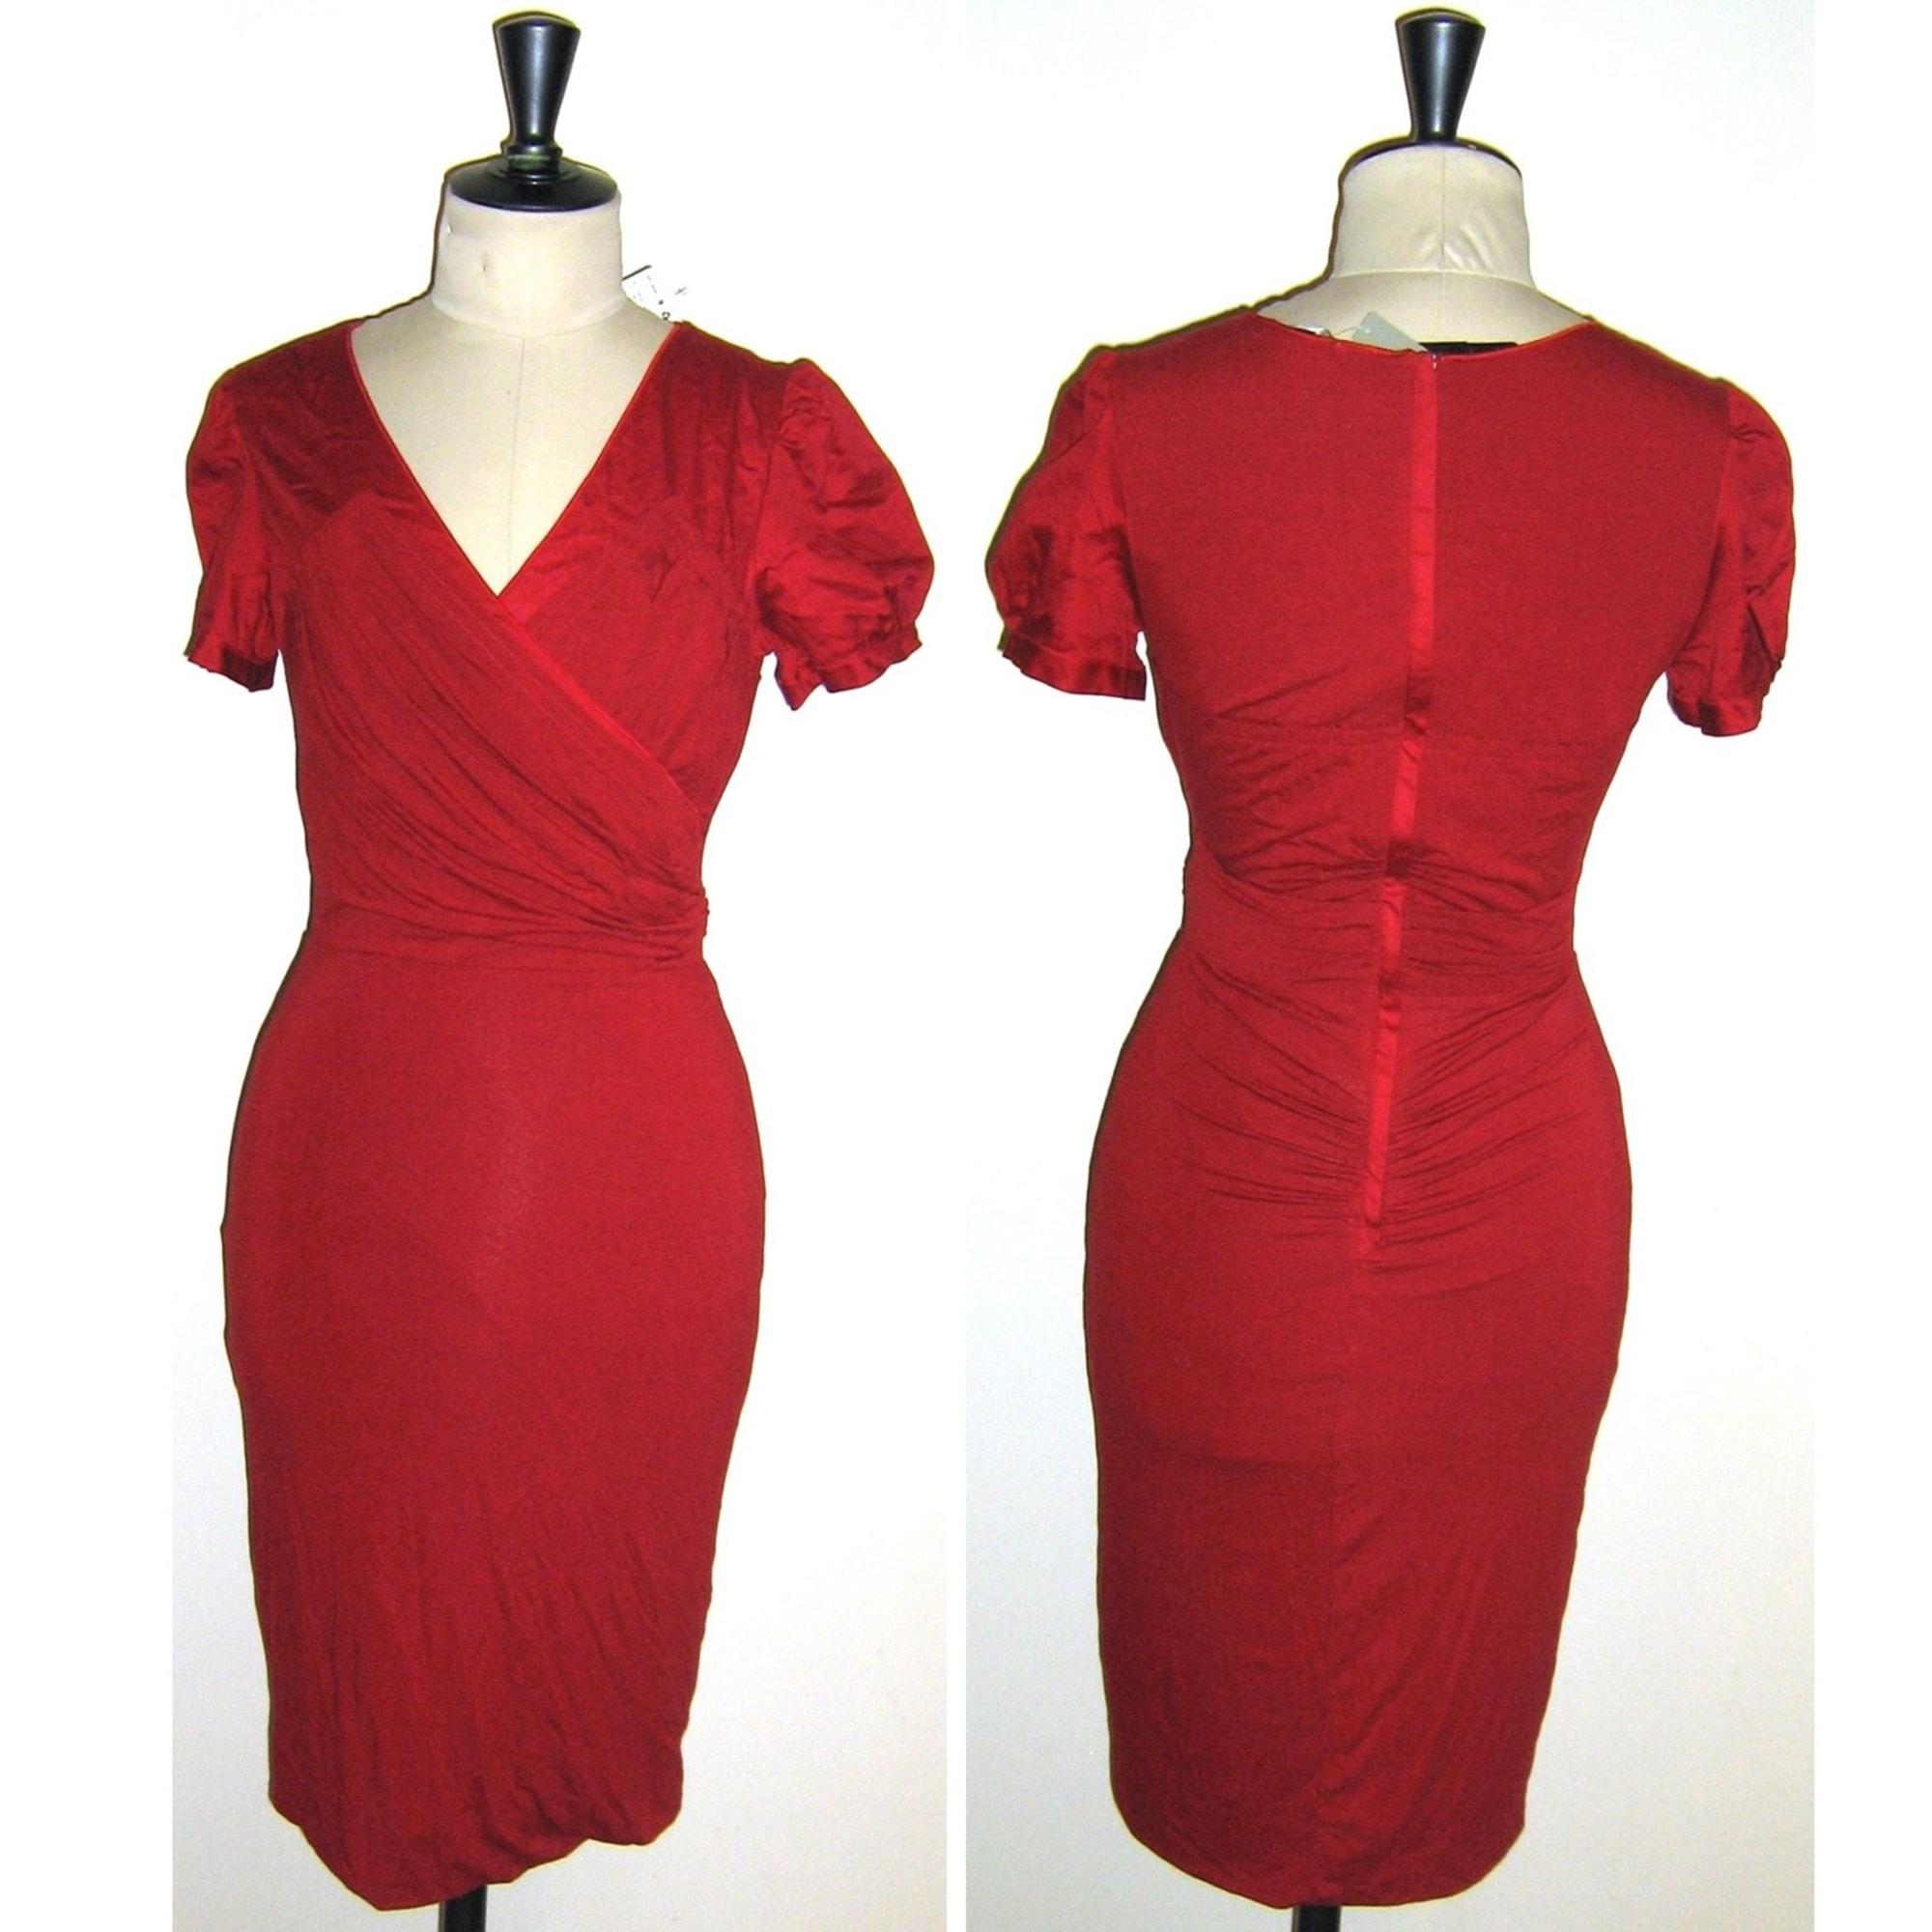 Robe mi-longue MANGO 38 (M, T2) rouge - 7371515 8264c7952d09